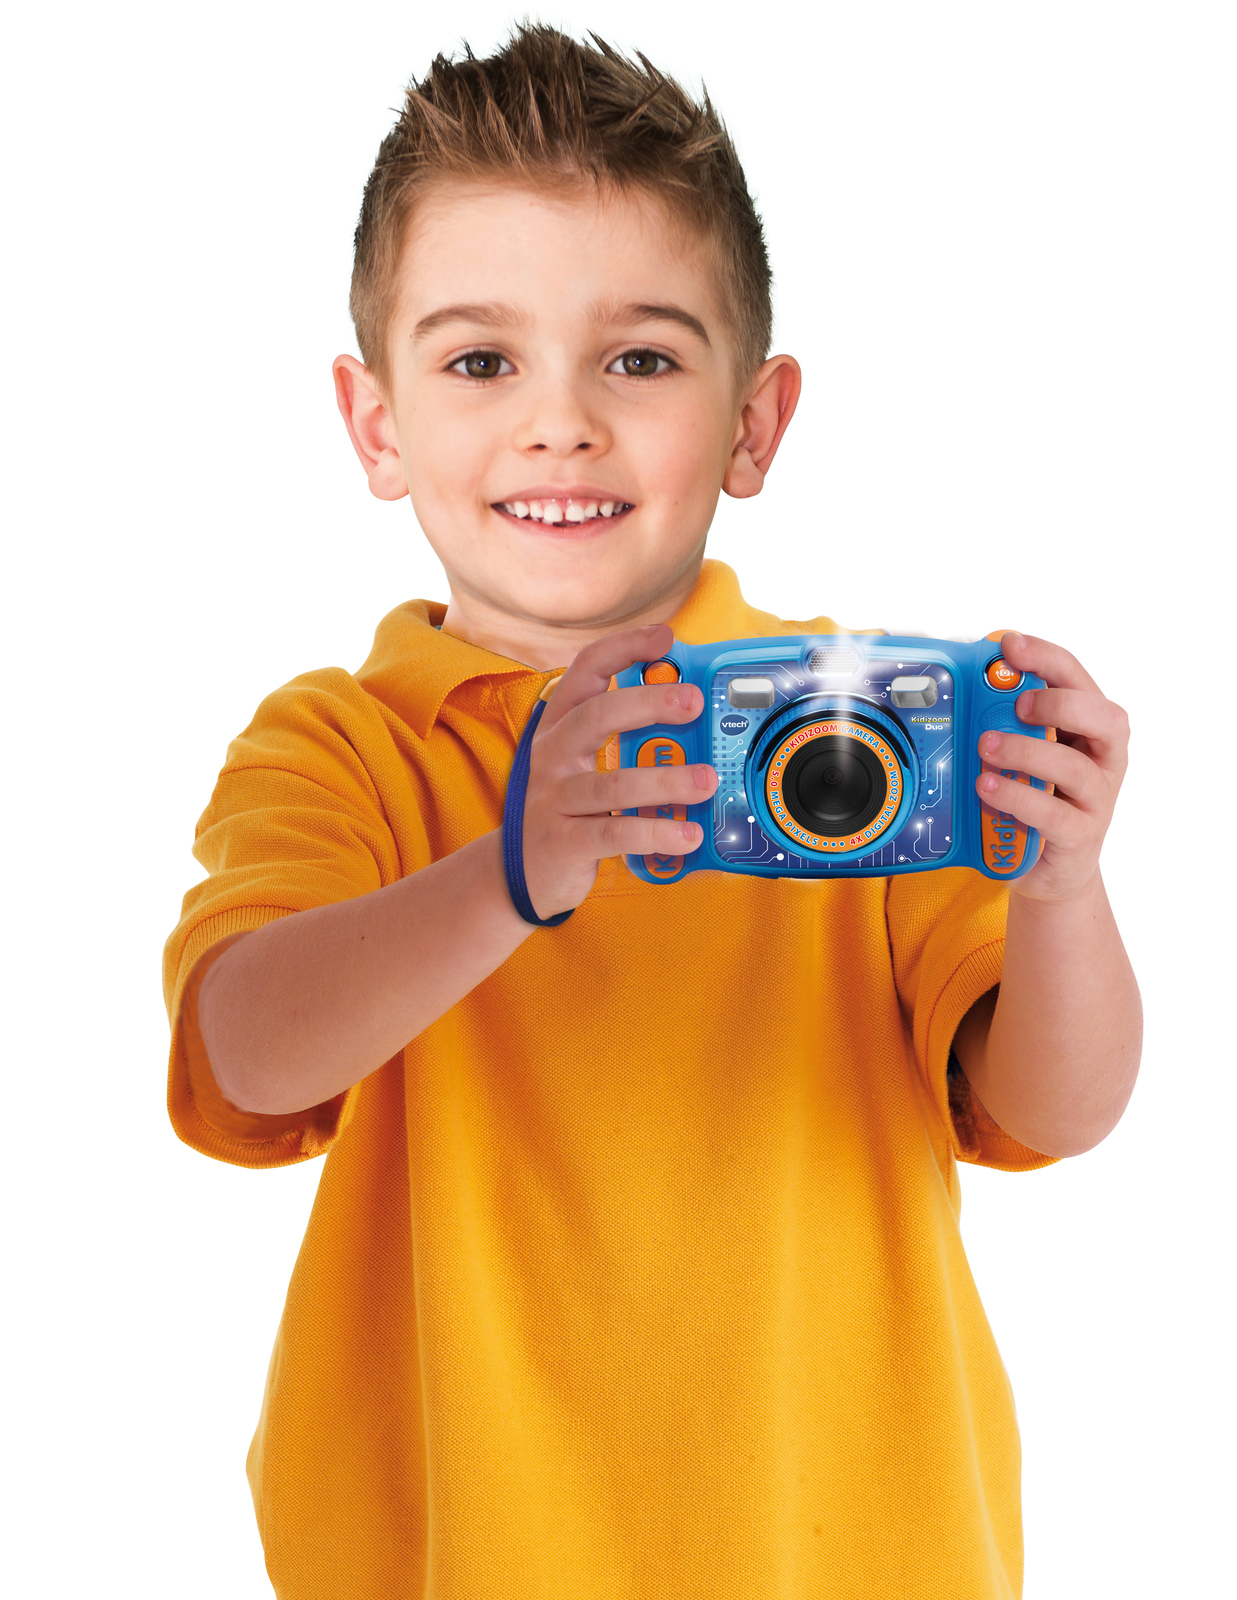 Vtech: Kidizoom Duo 5.0 Camera - (Blue) image